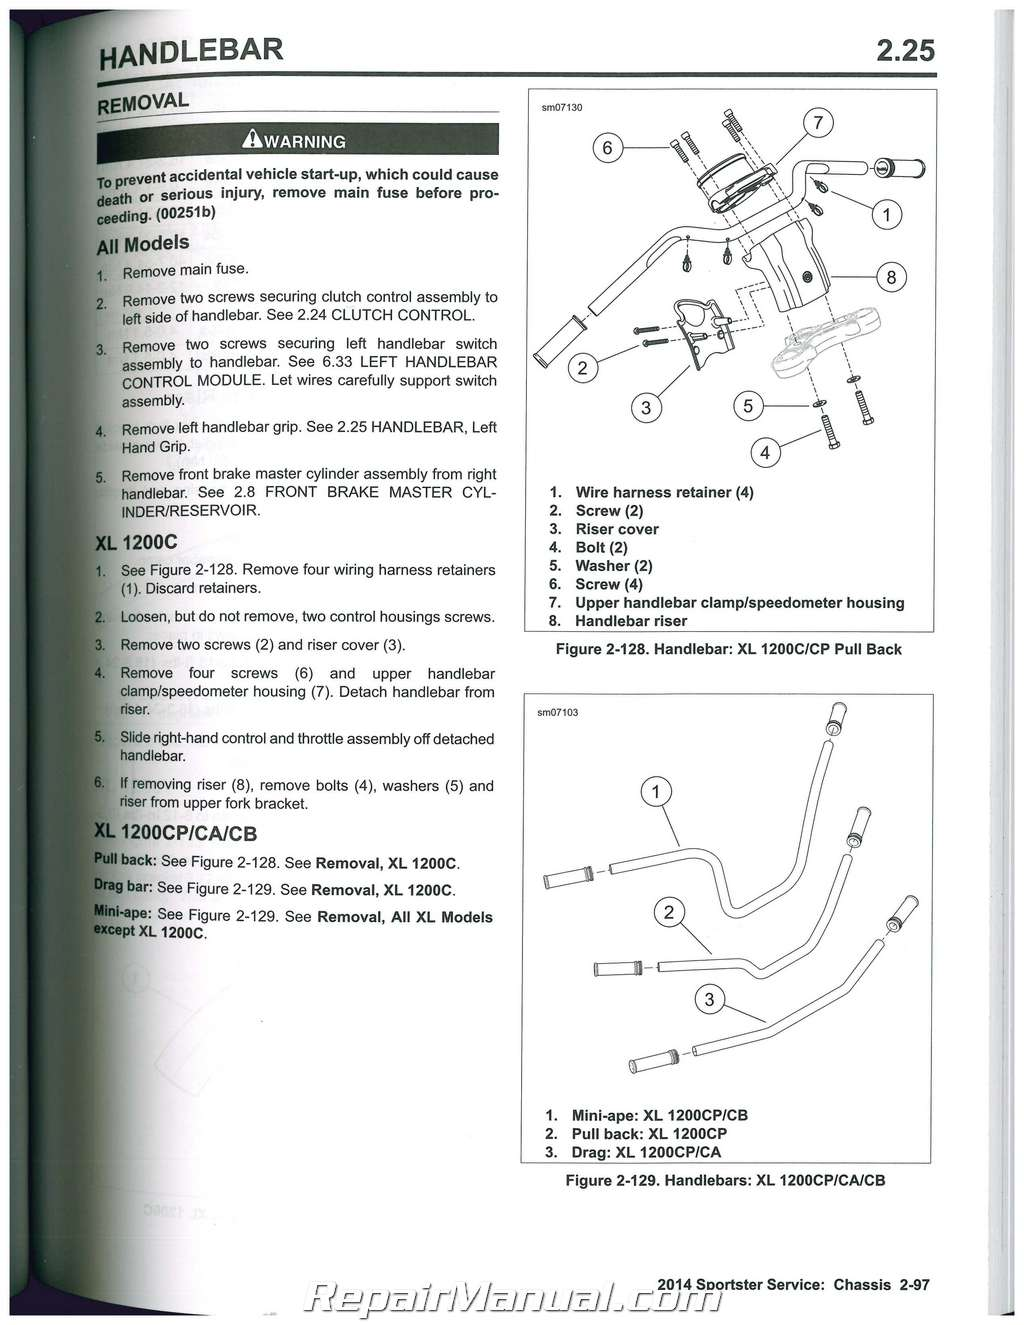 WRG-3427] Hand Controlls Harley Wiring Harness Diagram on